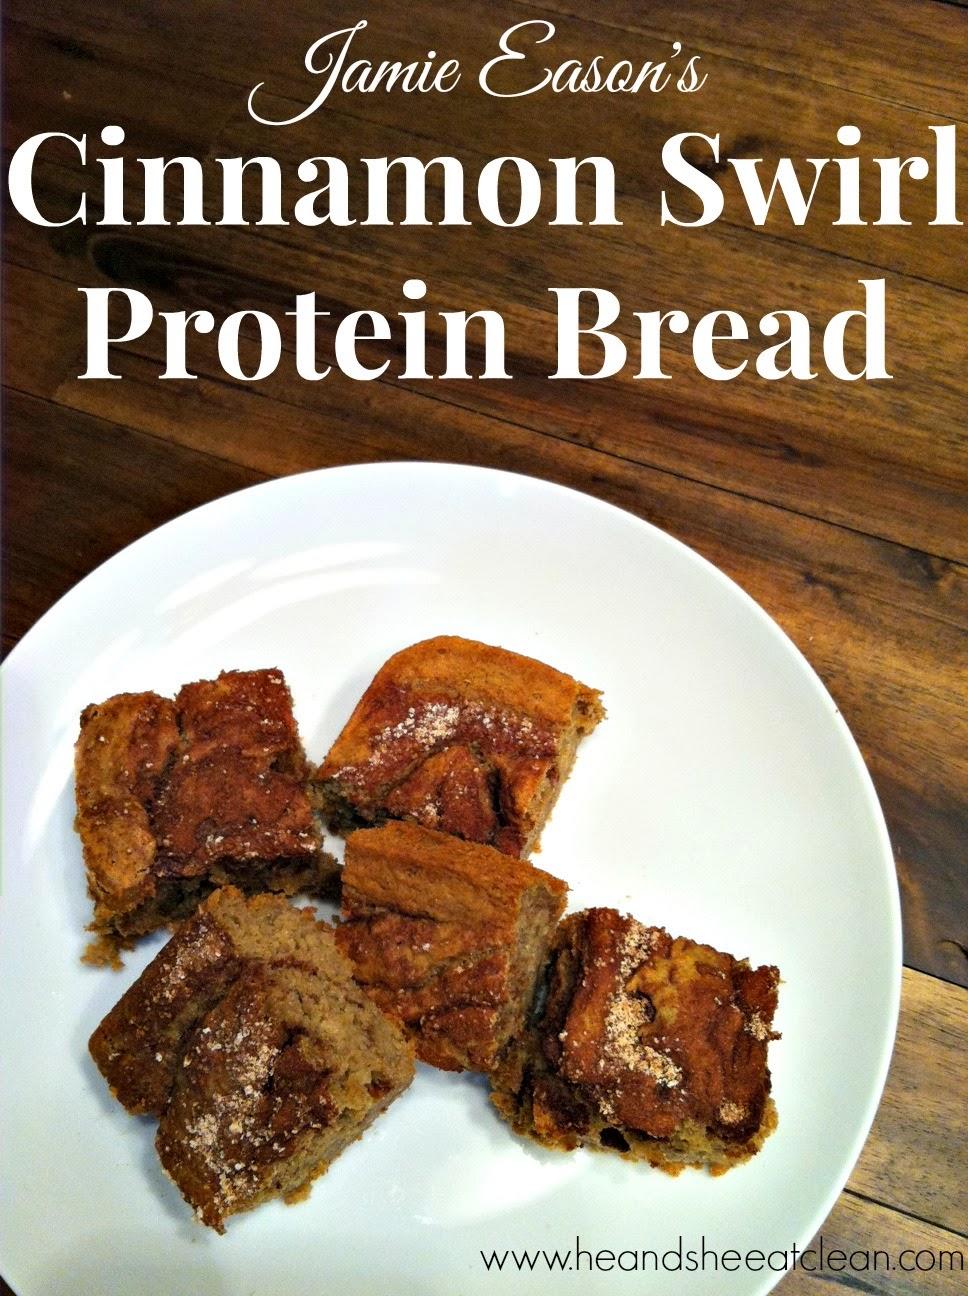 jamie-eason-middleton-cinnamon-swirl-protein-bread-bar-recipe-vanilla-powder-he-she-eat-clean-make-gluten-free.jpg